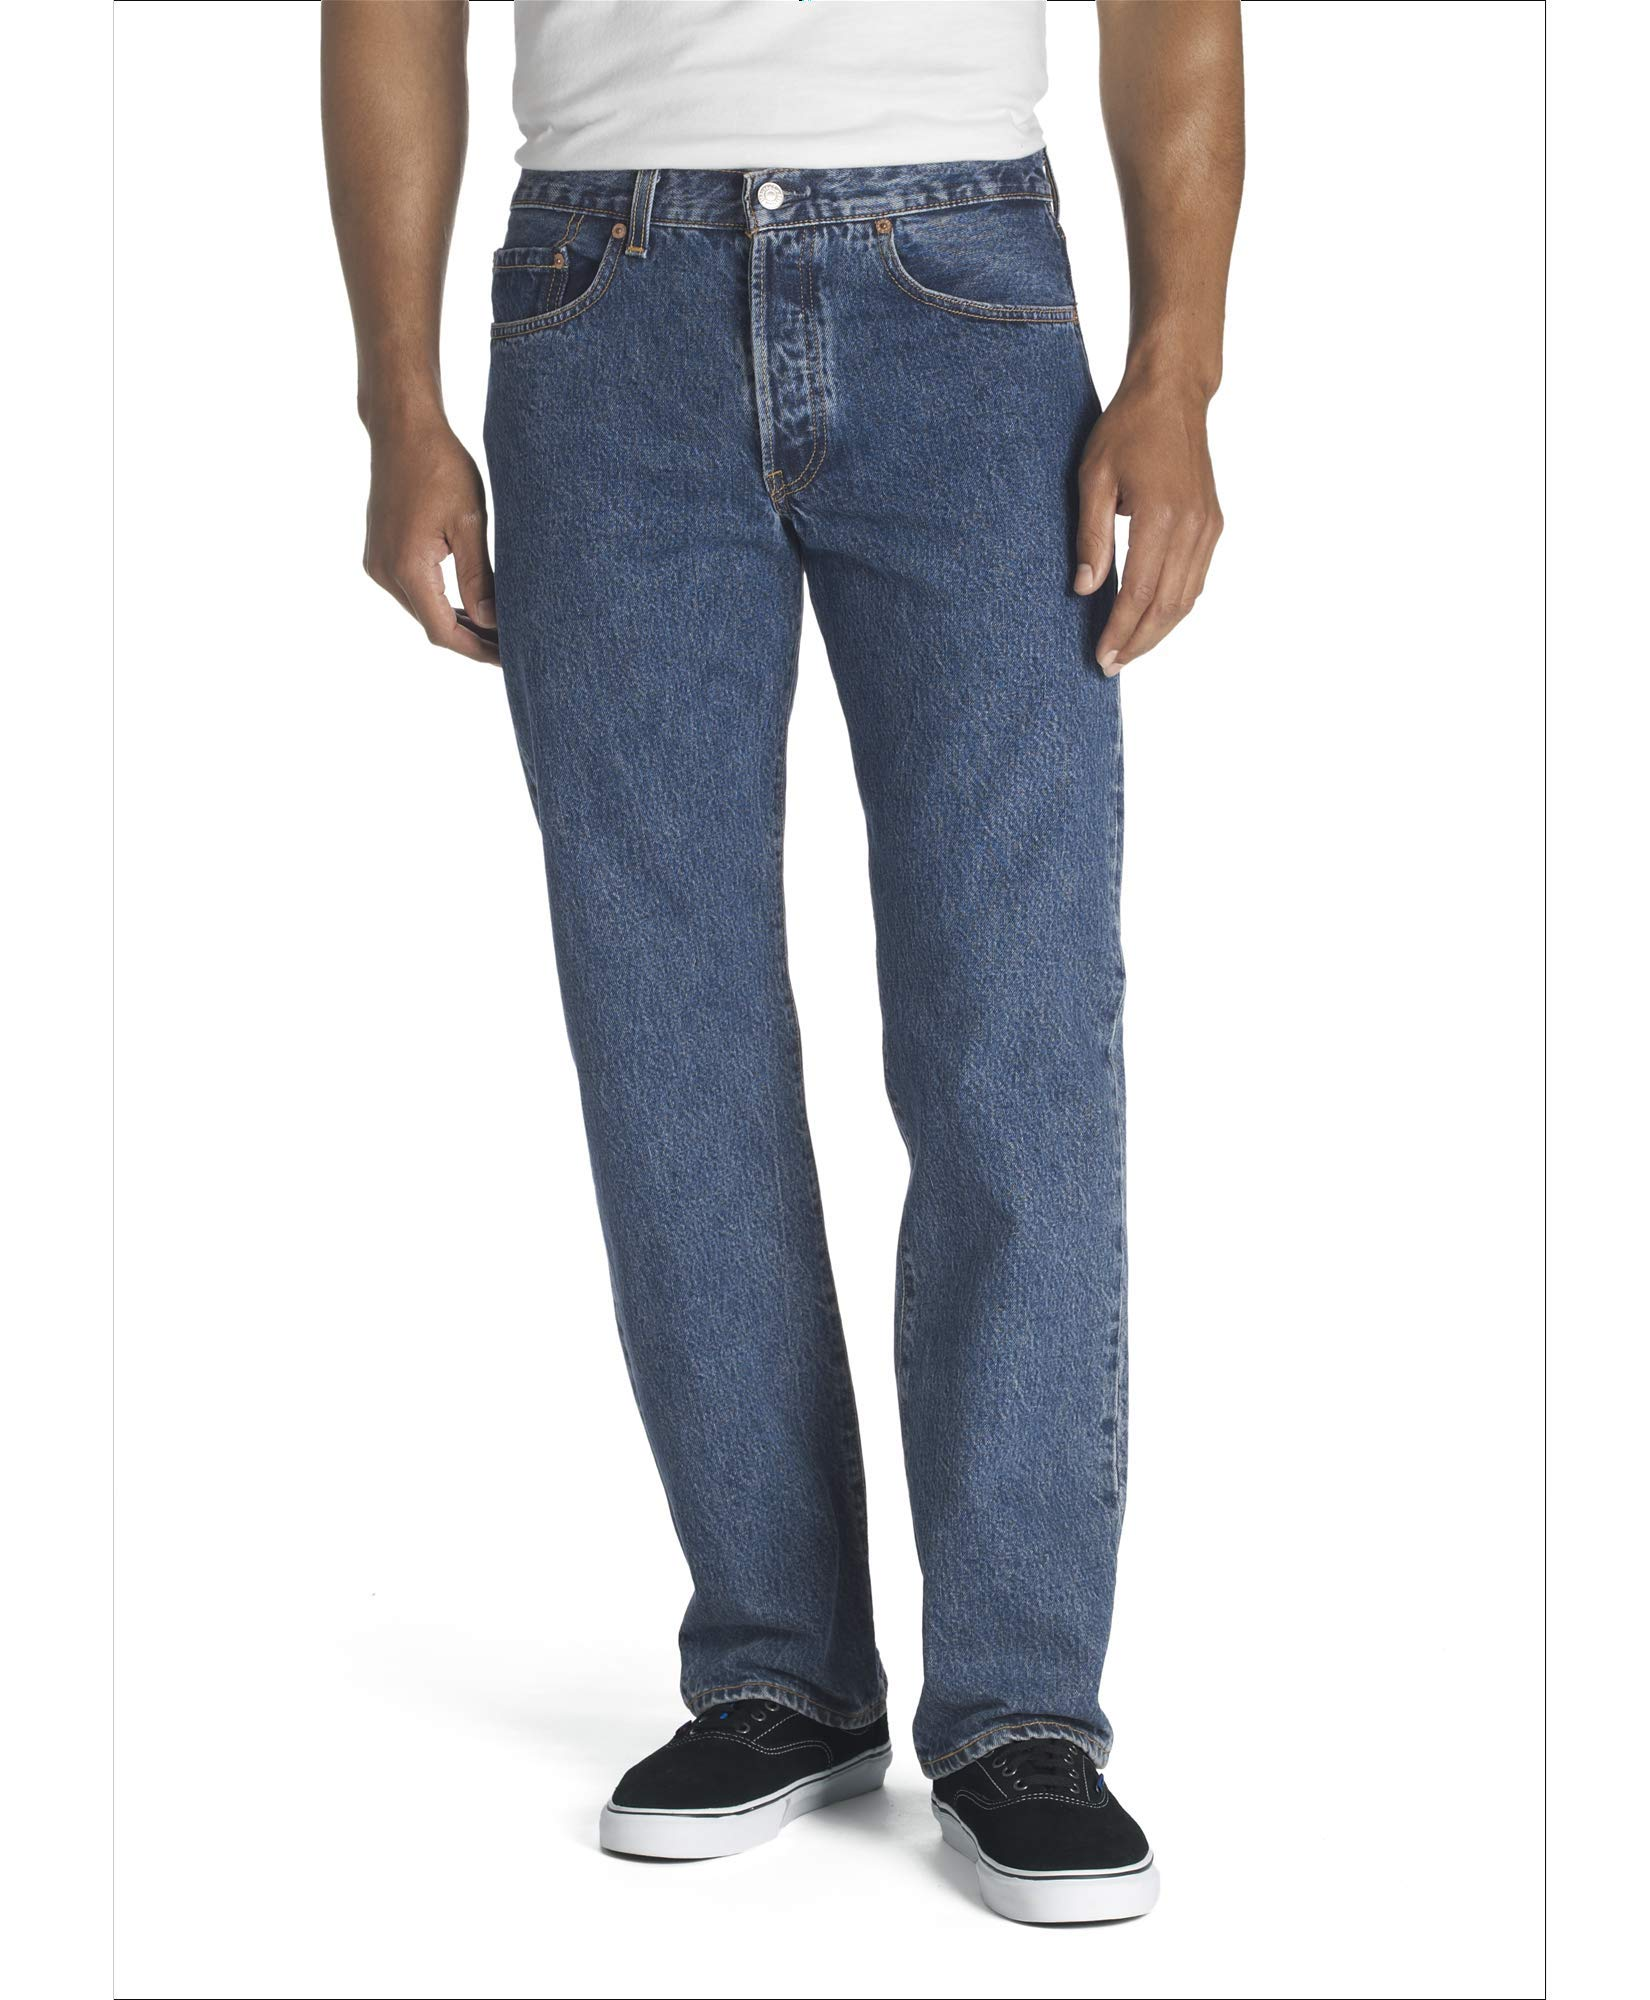 Levi's Men's 501 Original Fit Jean, Dark Stonewash, 31x32 by Levi's